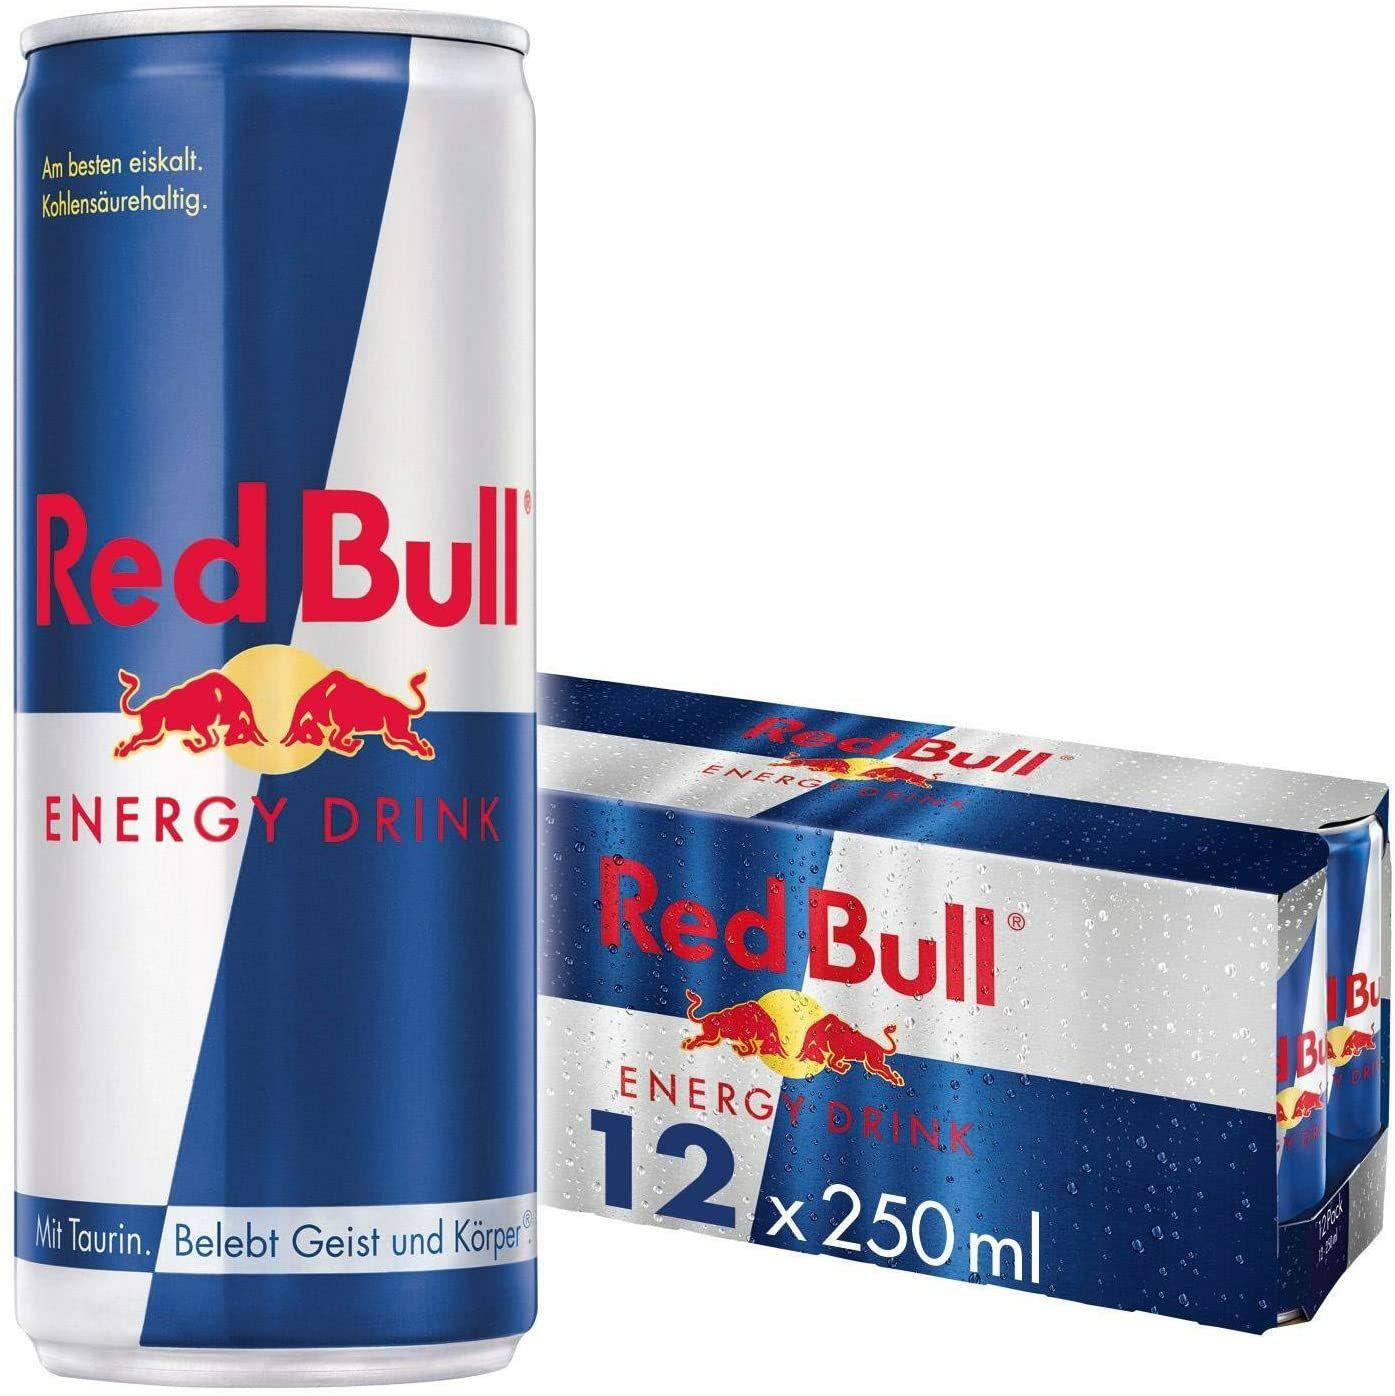 Red Bull 12 x 250 ml - £11.85 with Prime on Amazon / £16.34 non-Prime